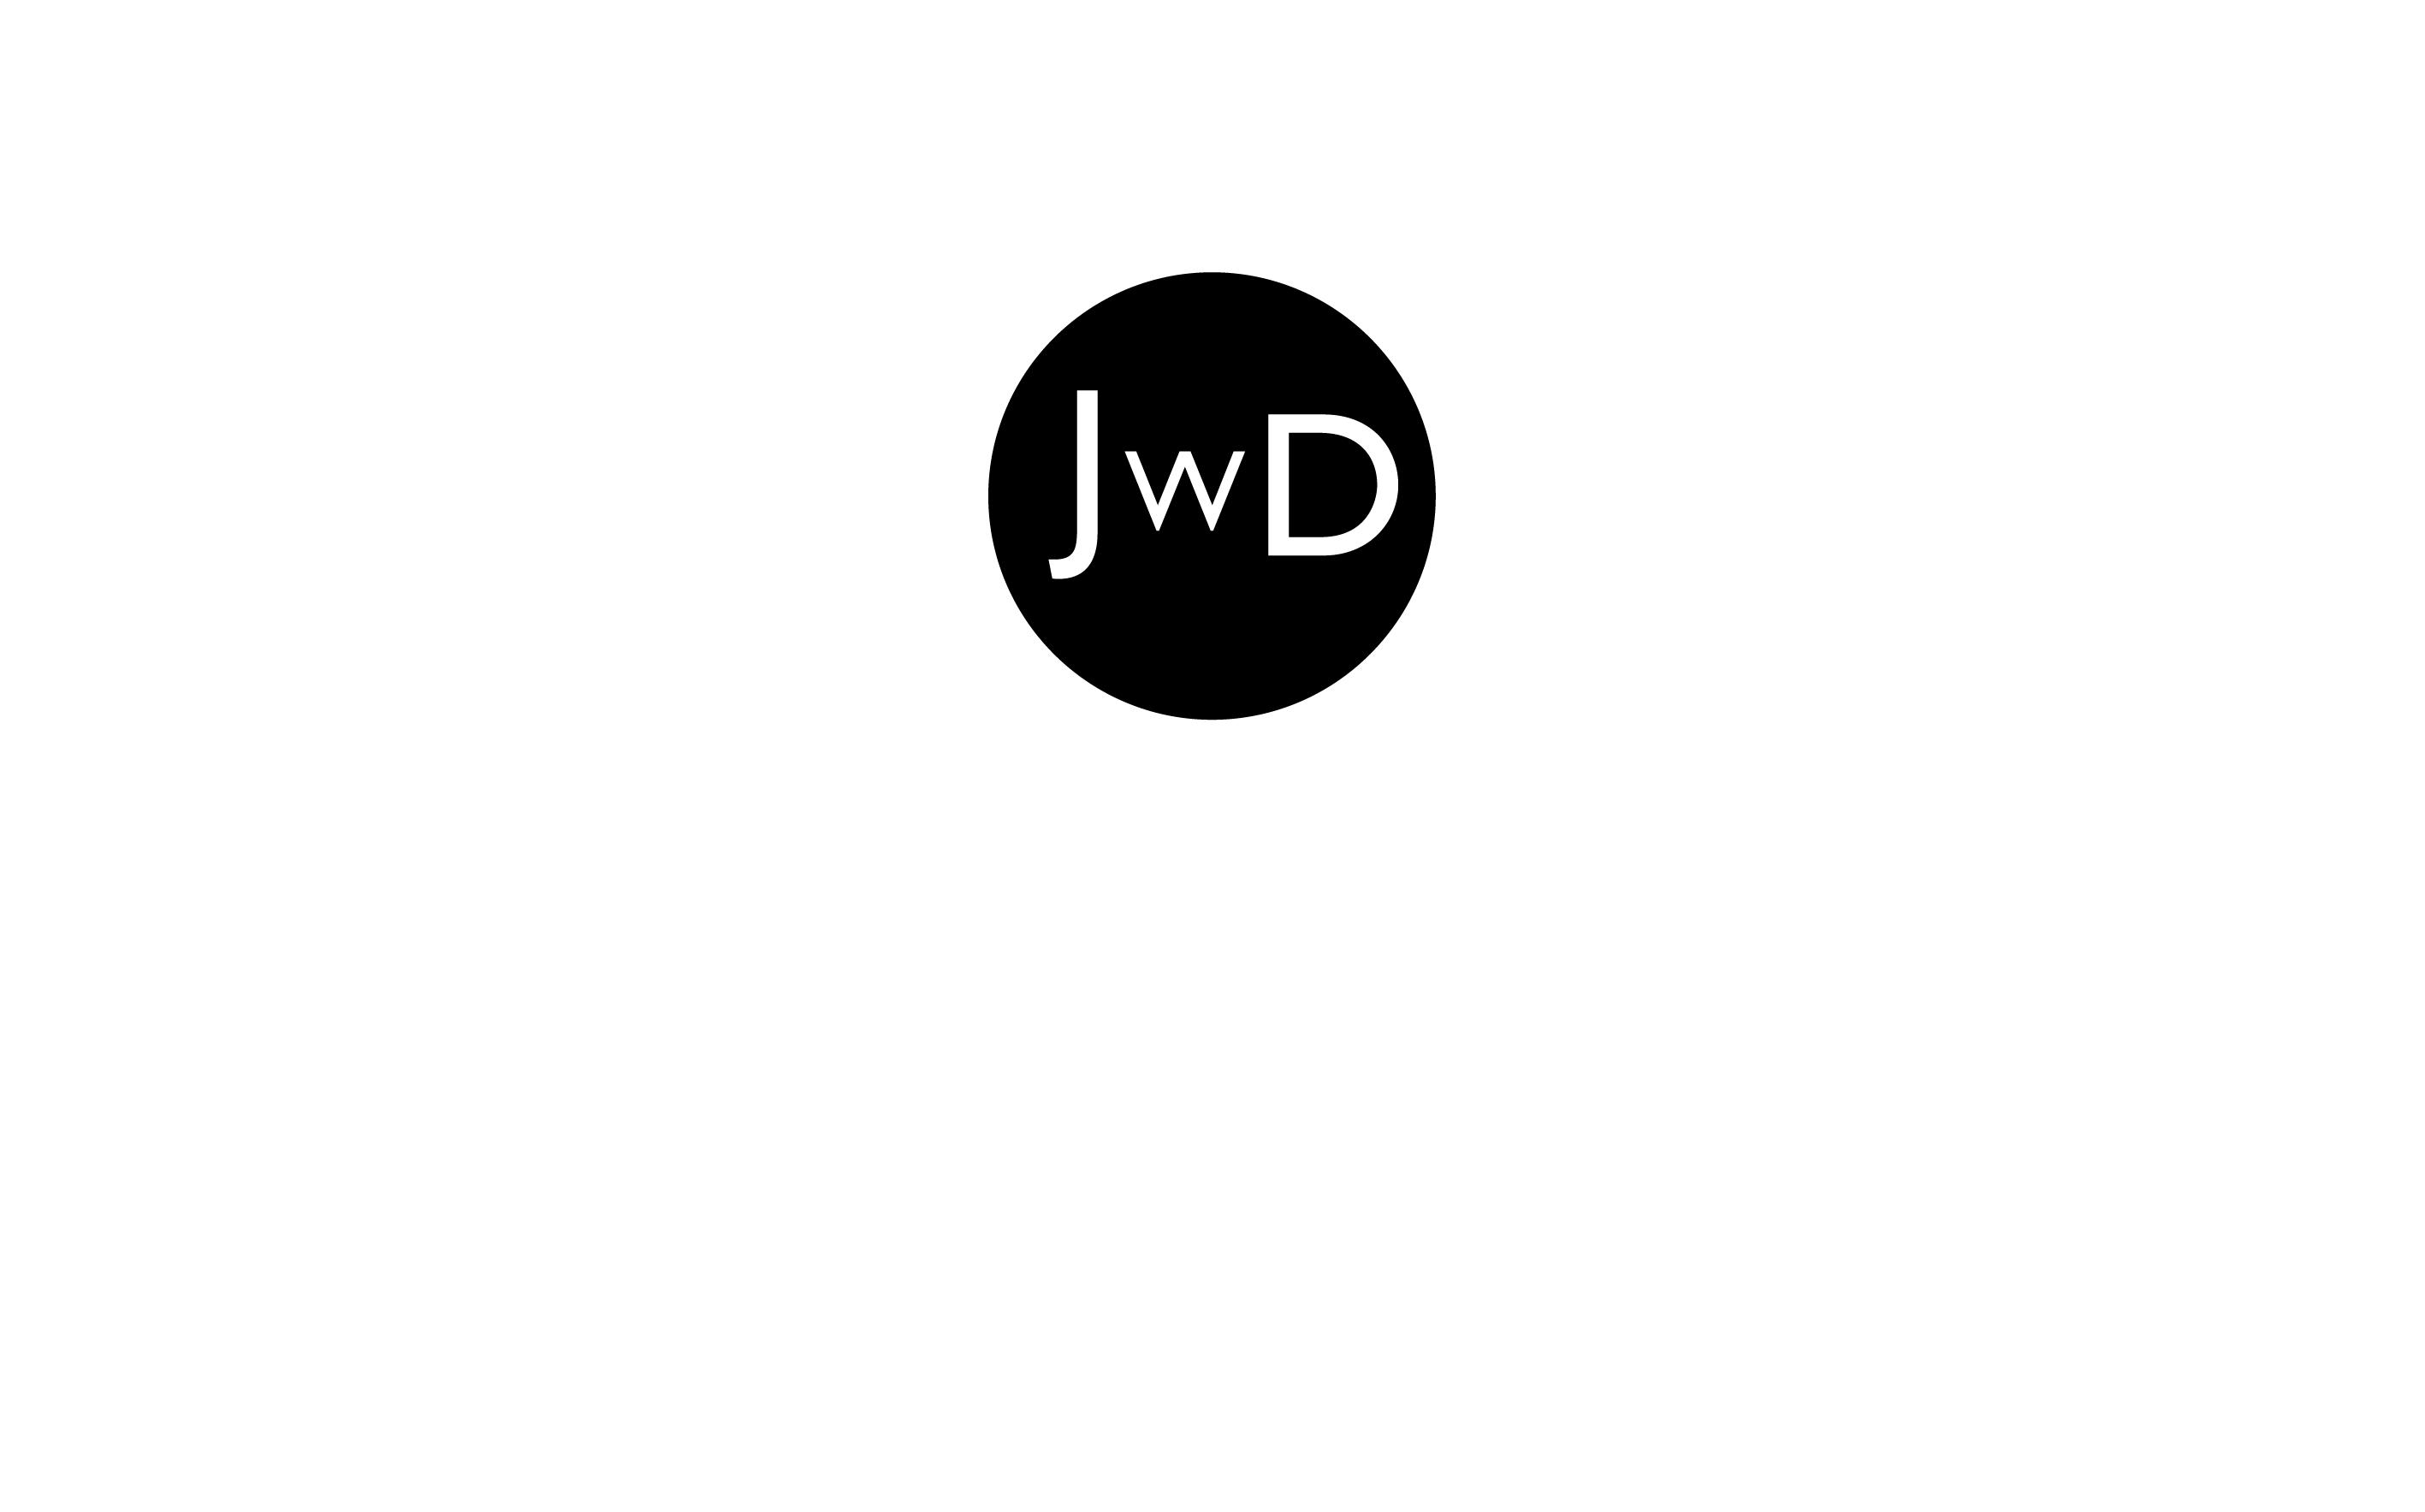 Logo jana Williama Drnekena